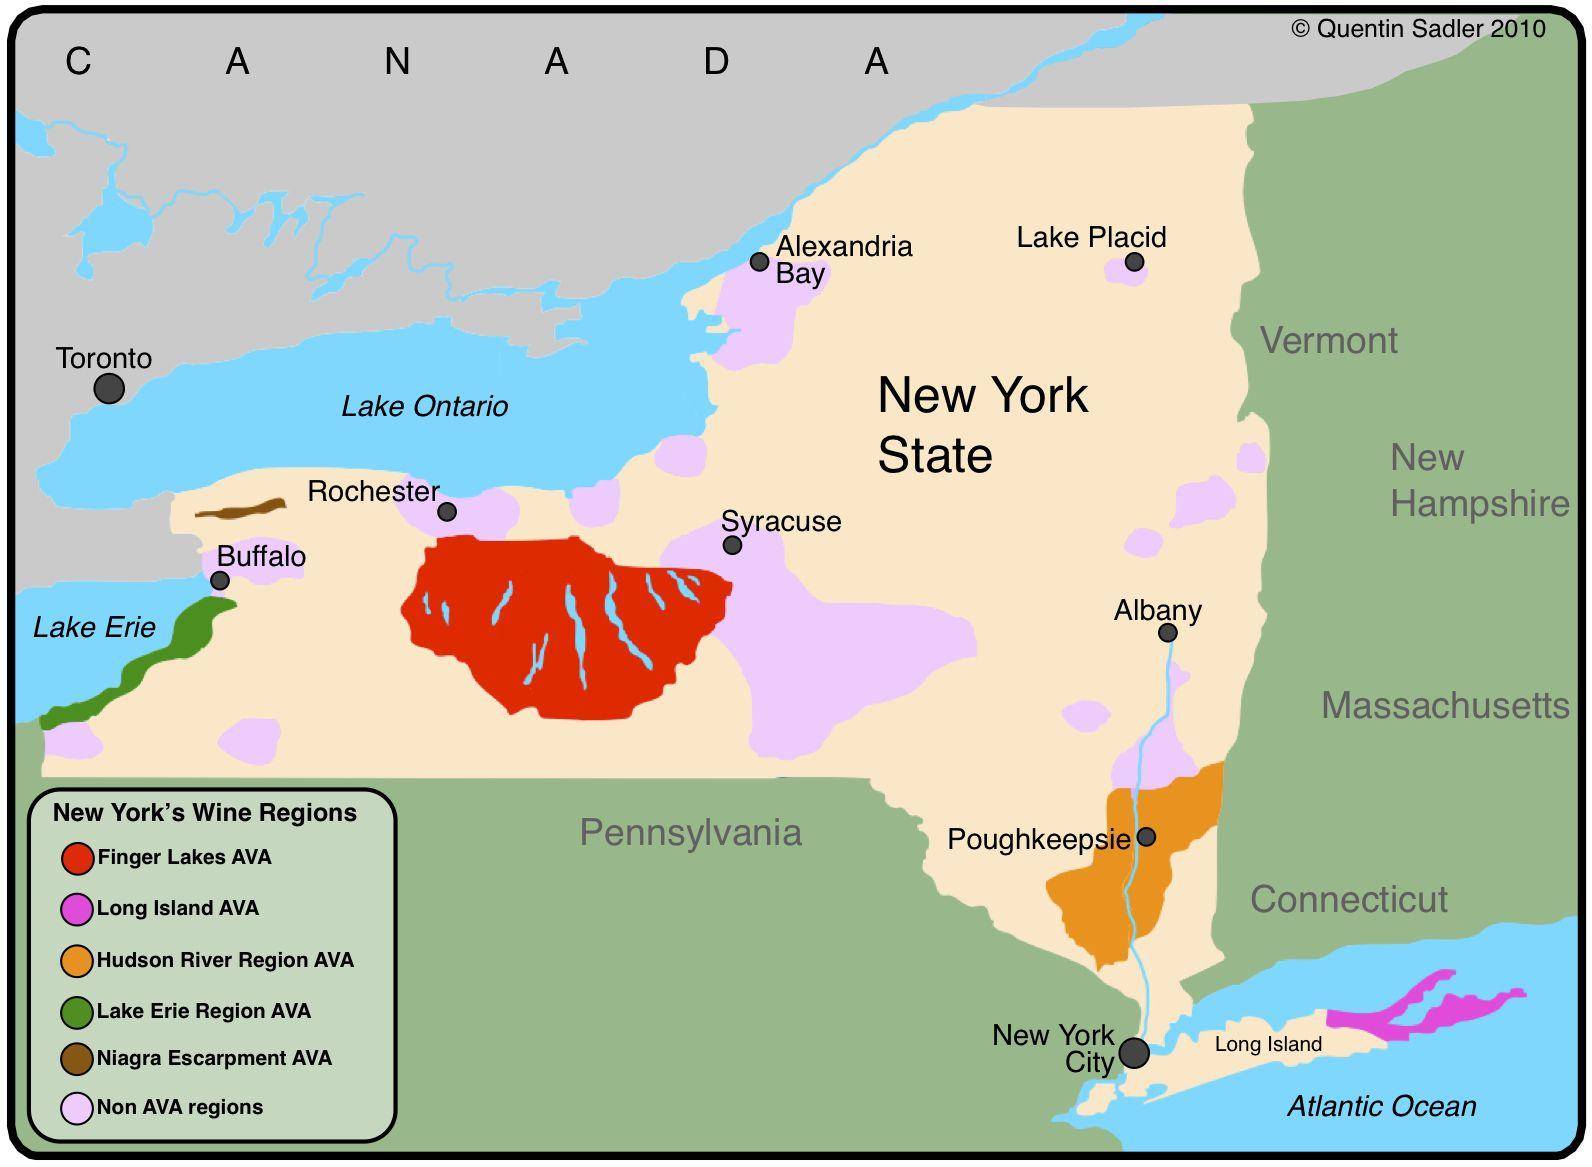 Map Of New York Wineries.New York State Wine Regions Seneca Falls New York Favorite